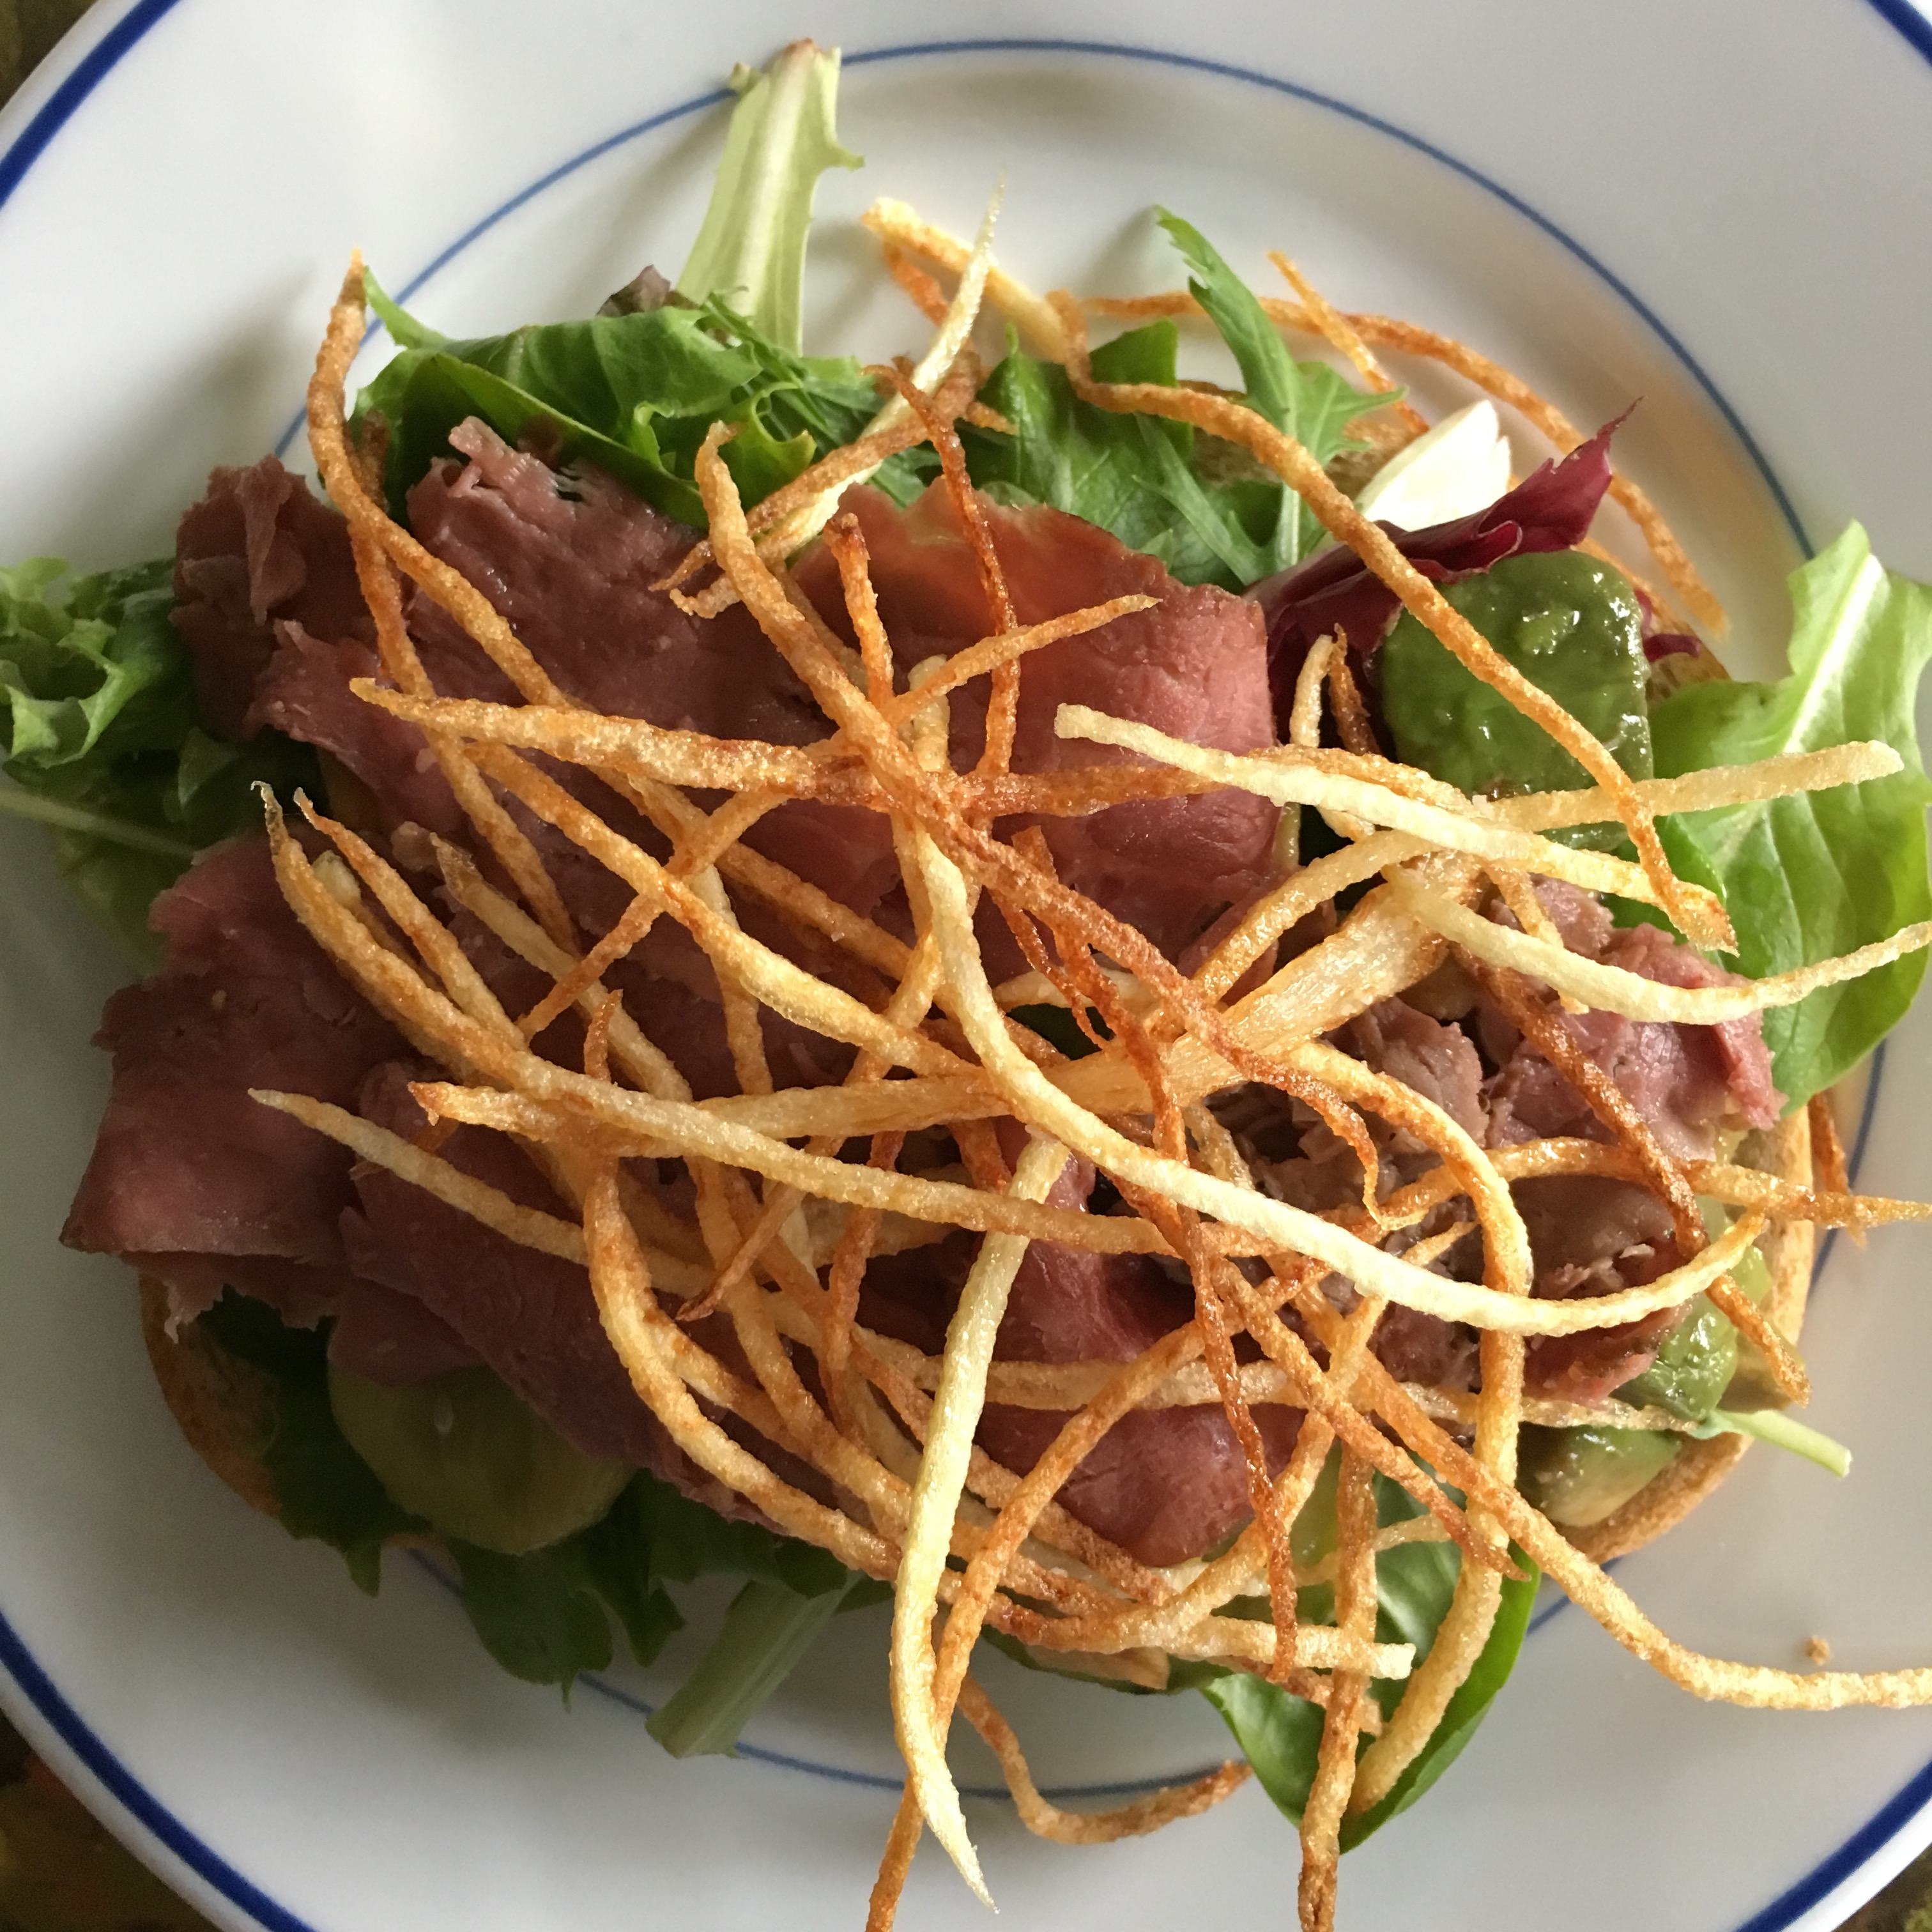 shoestring fried potatoes on sandwich